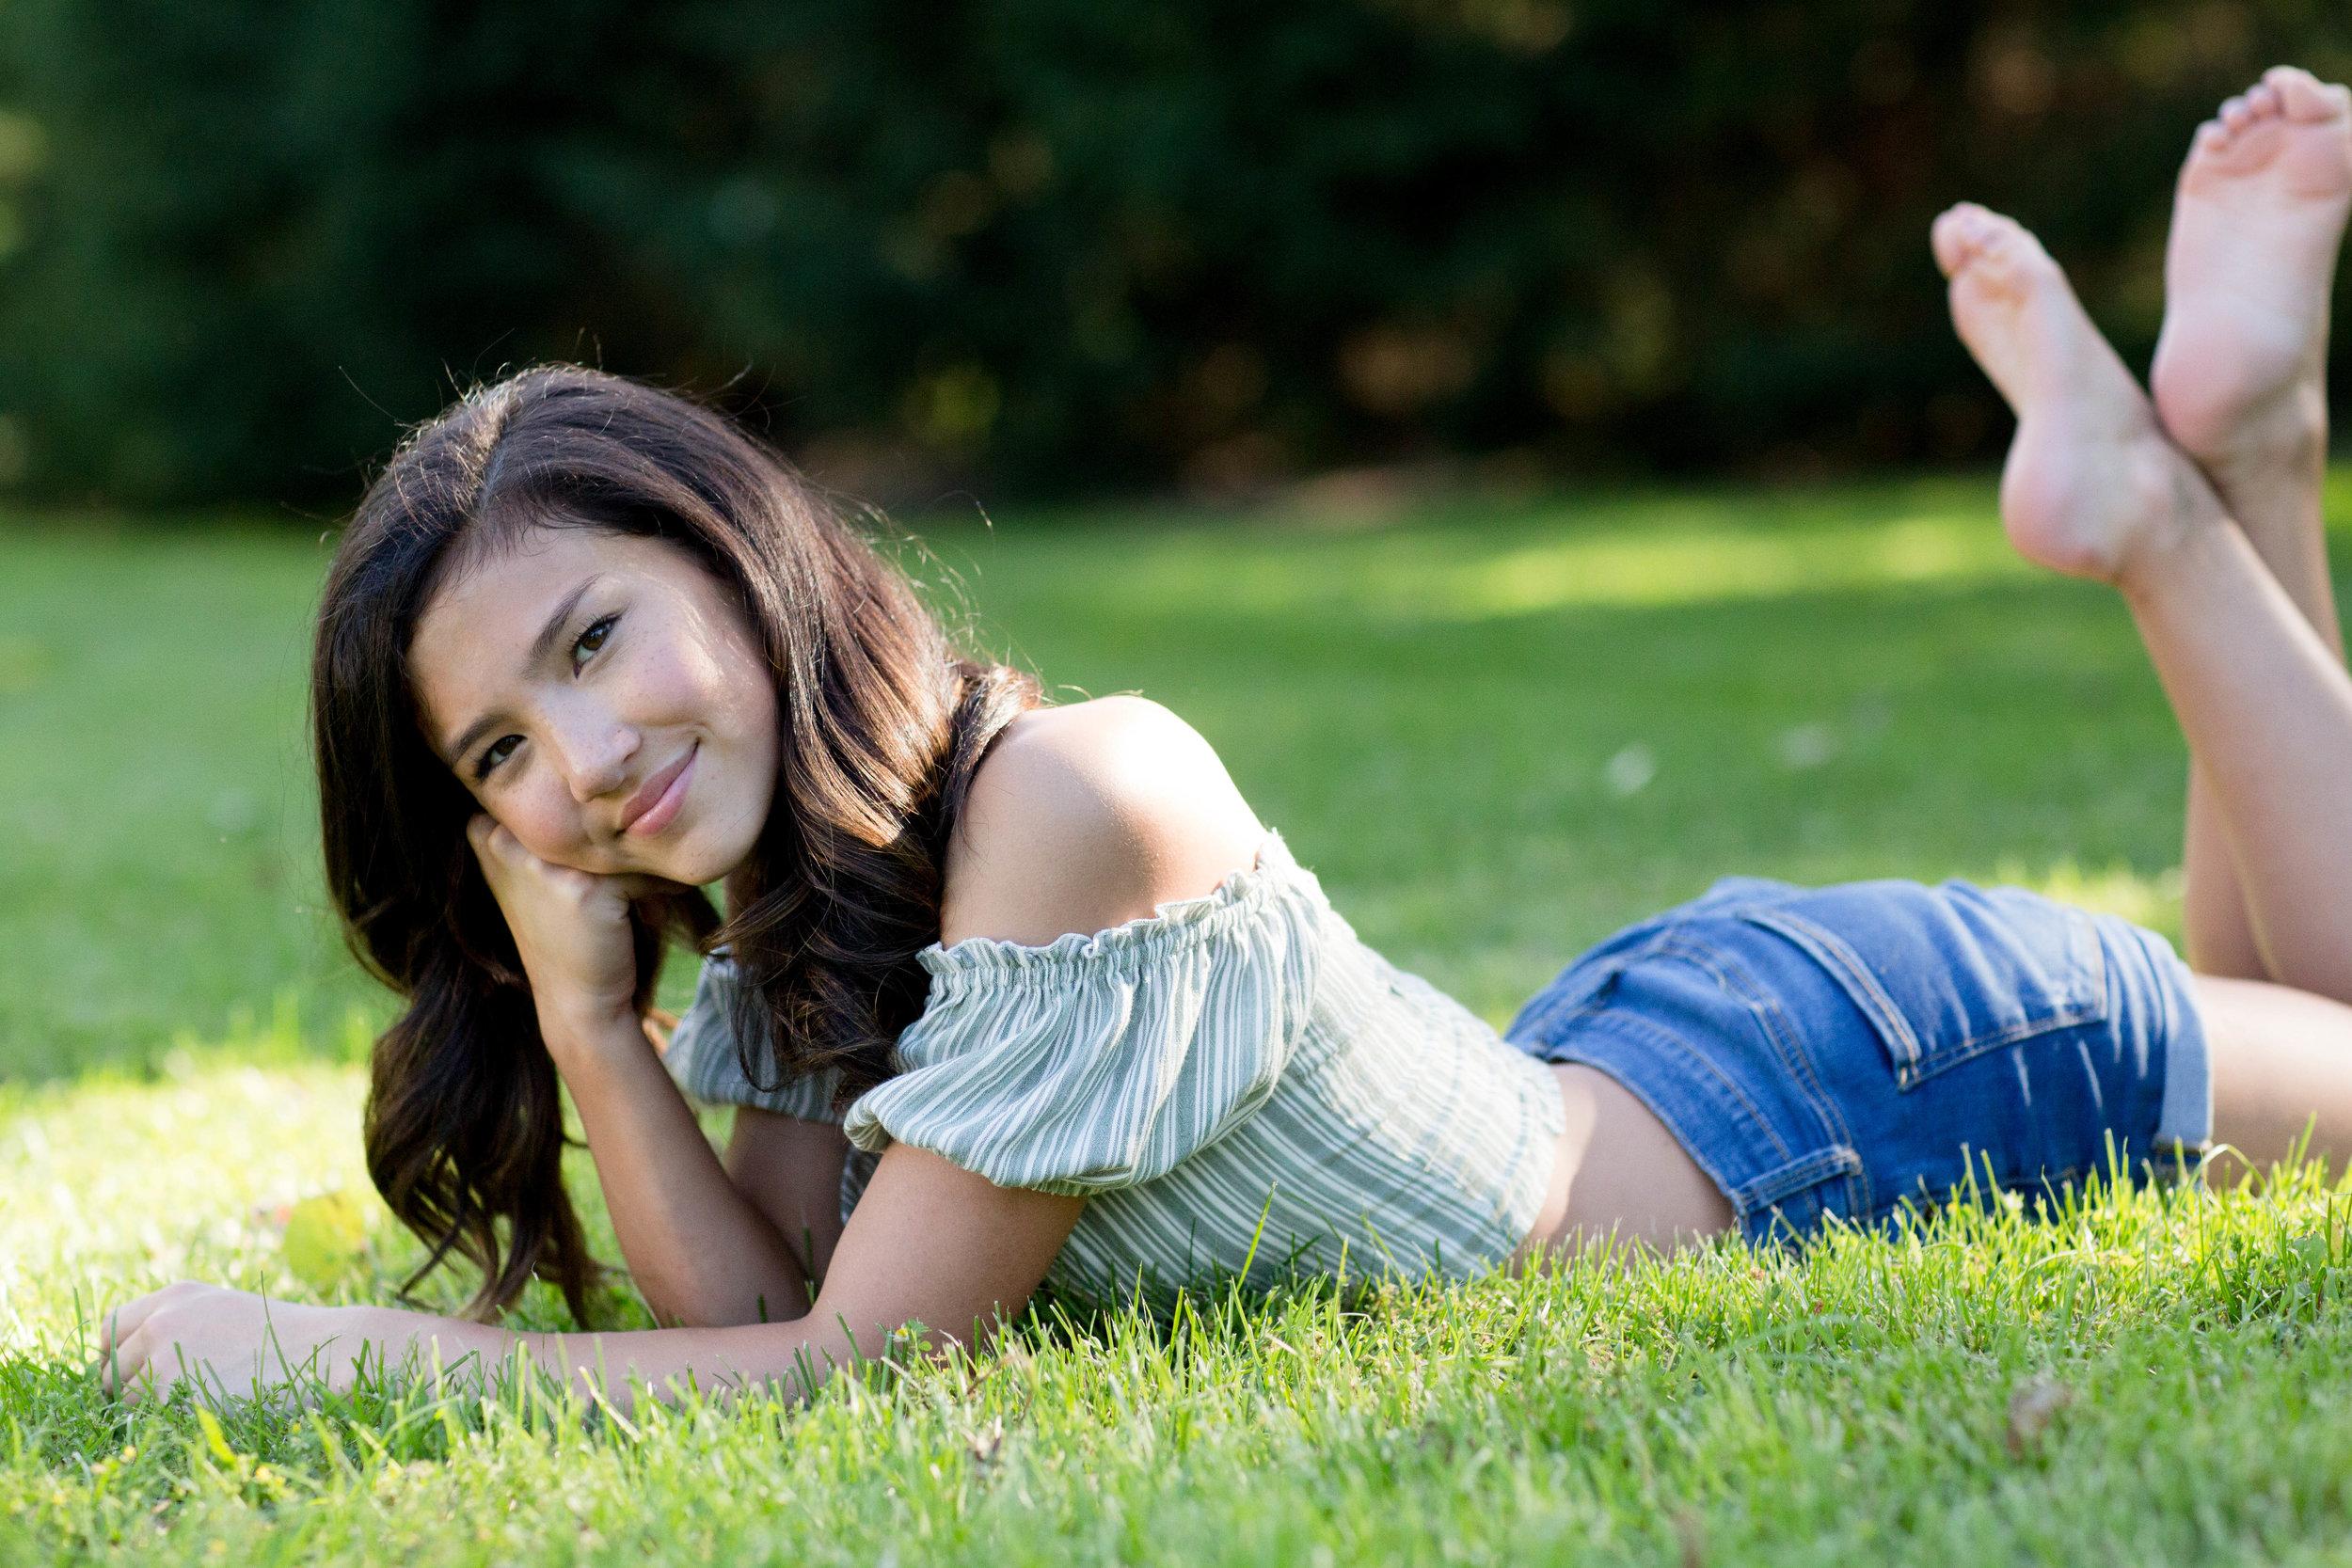 teen girl in grass.jpg